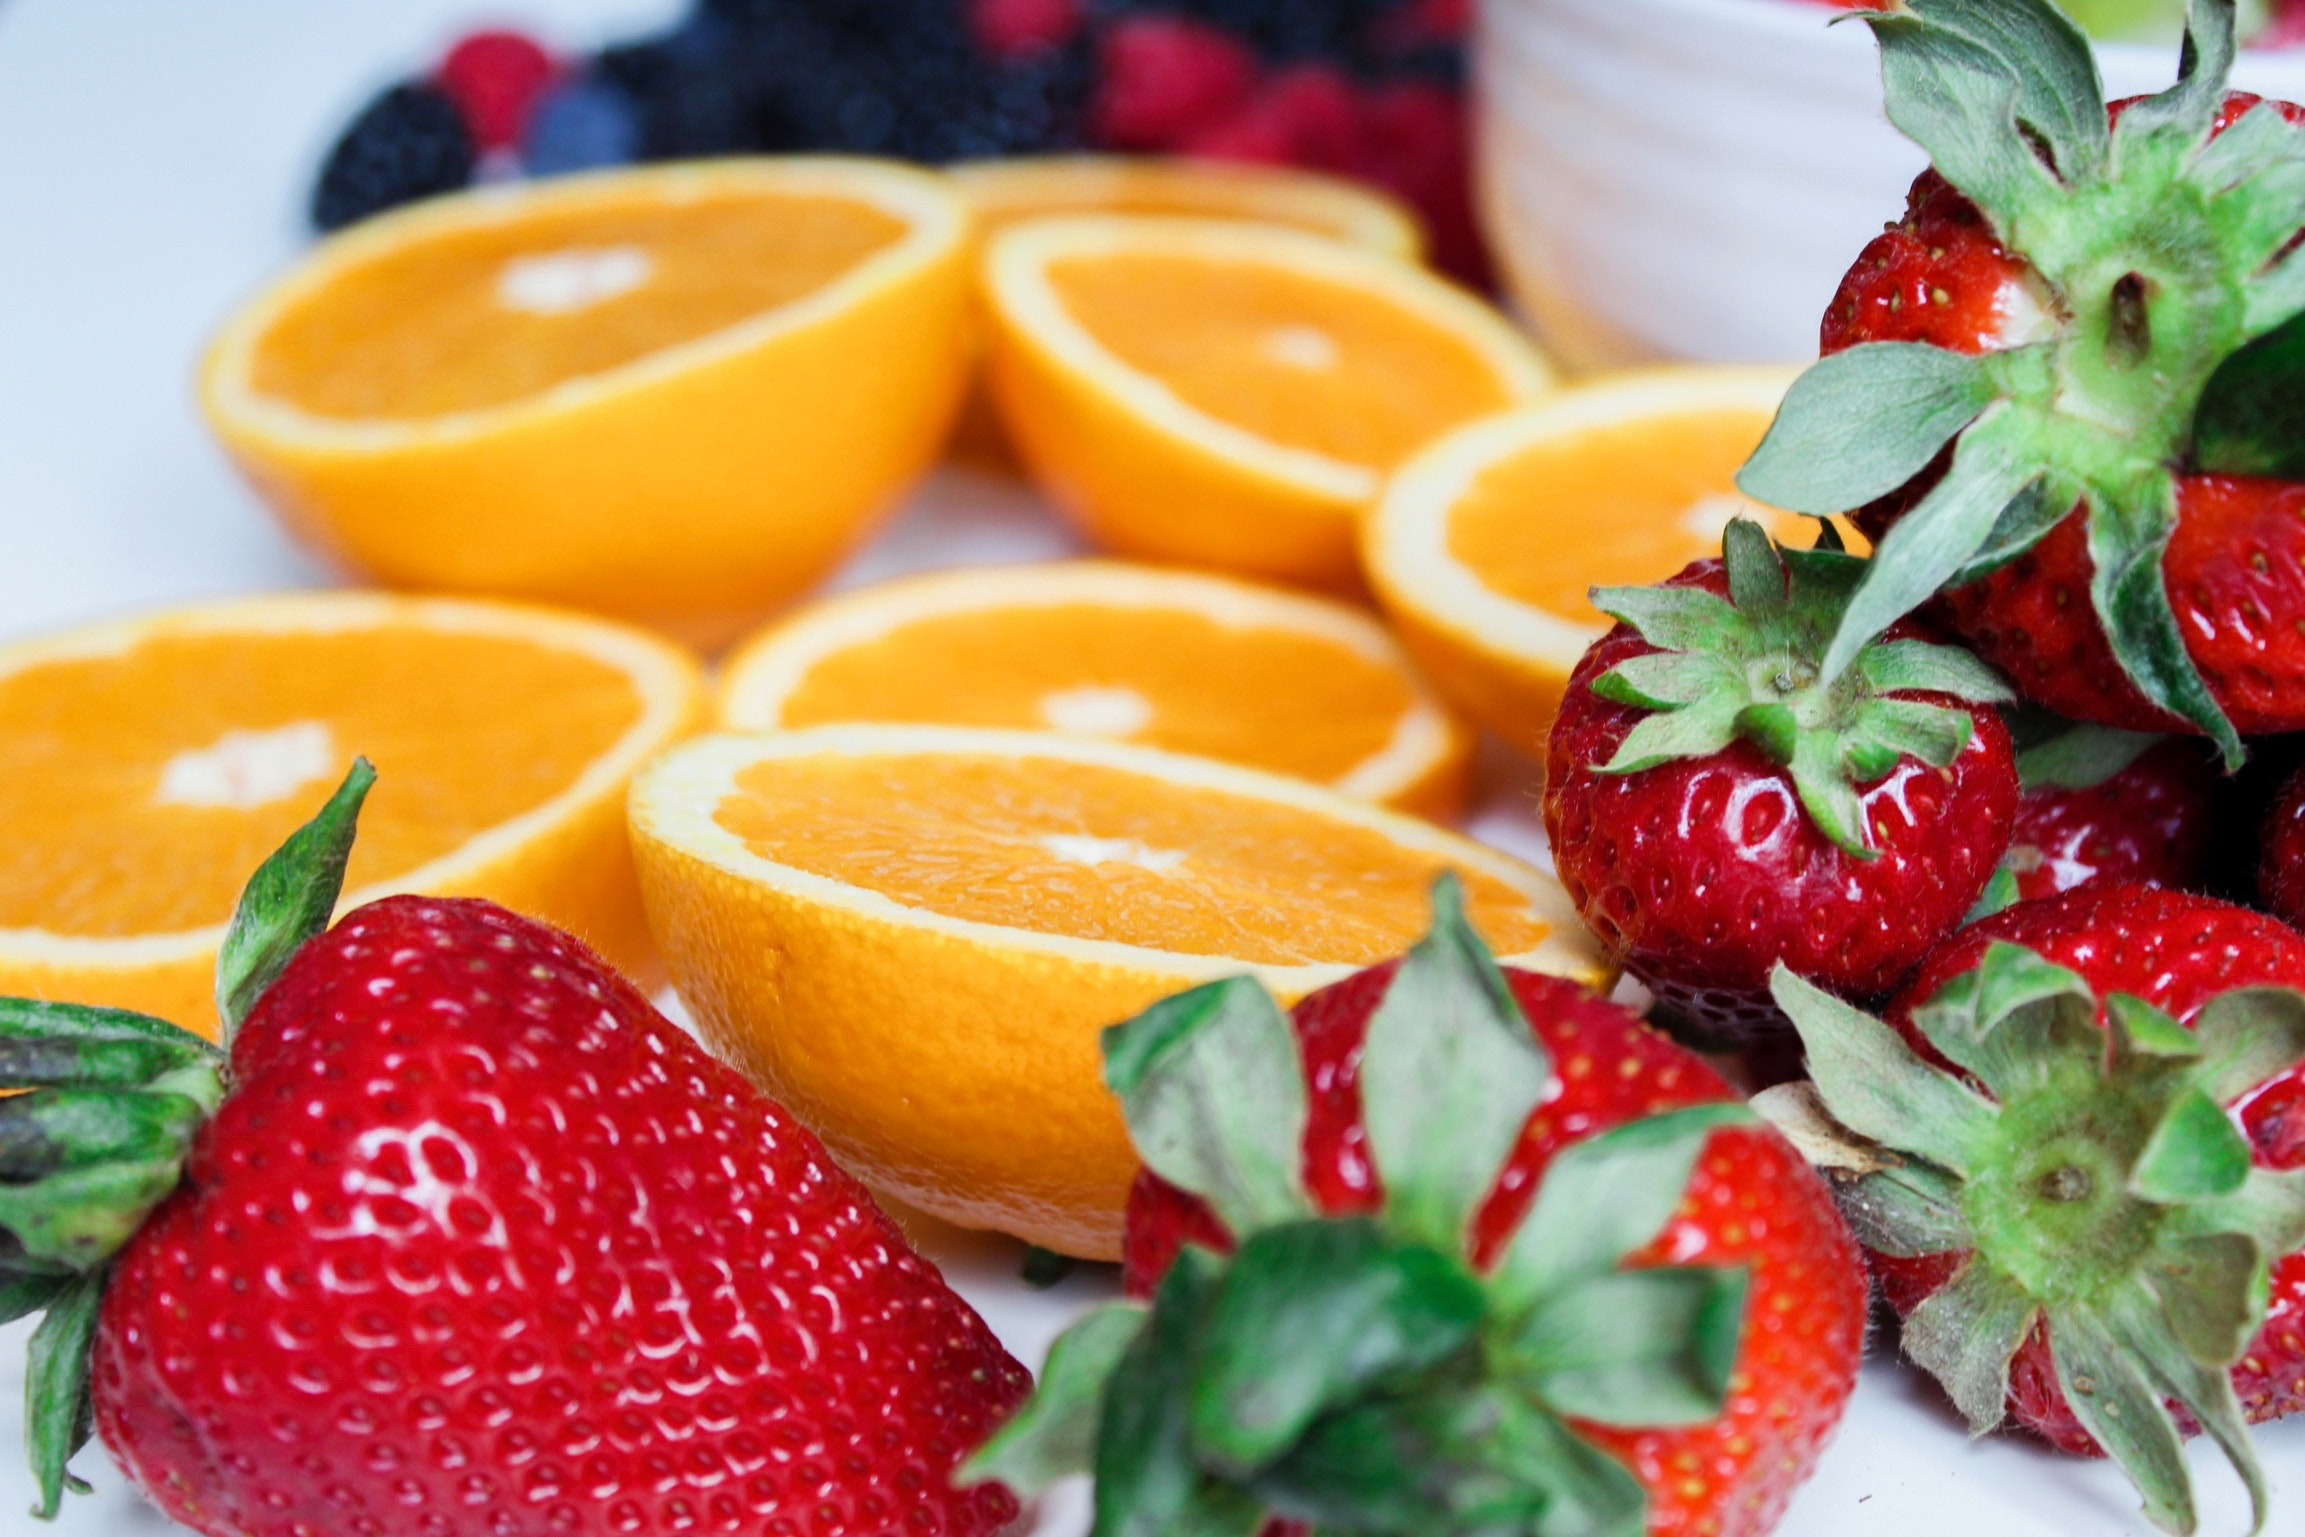 berries-close-up-colorful-1132040.jpg